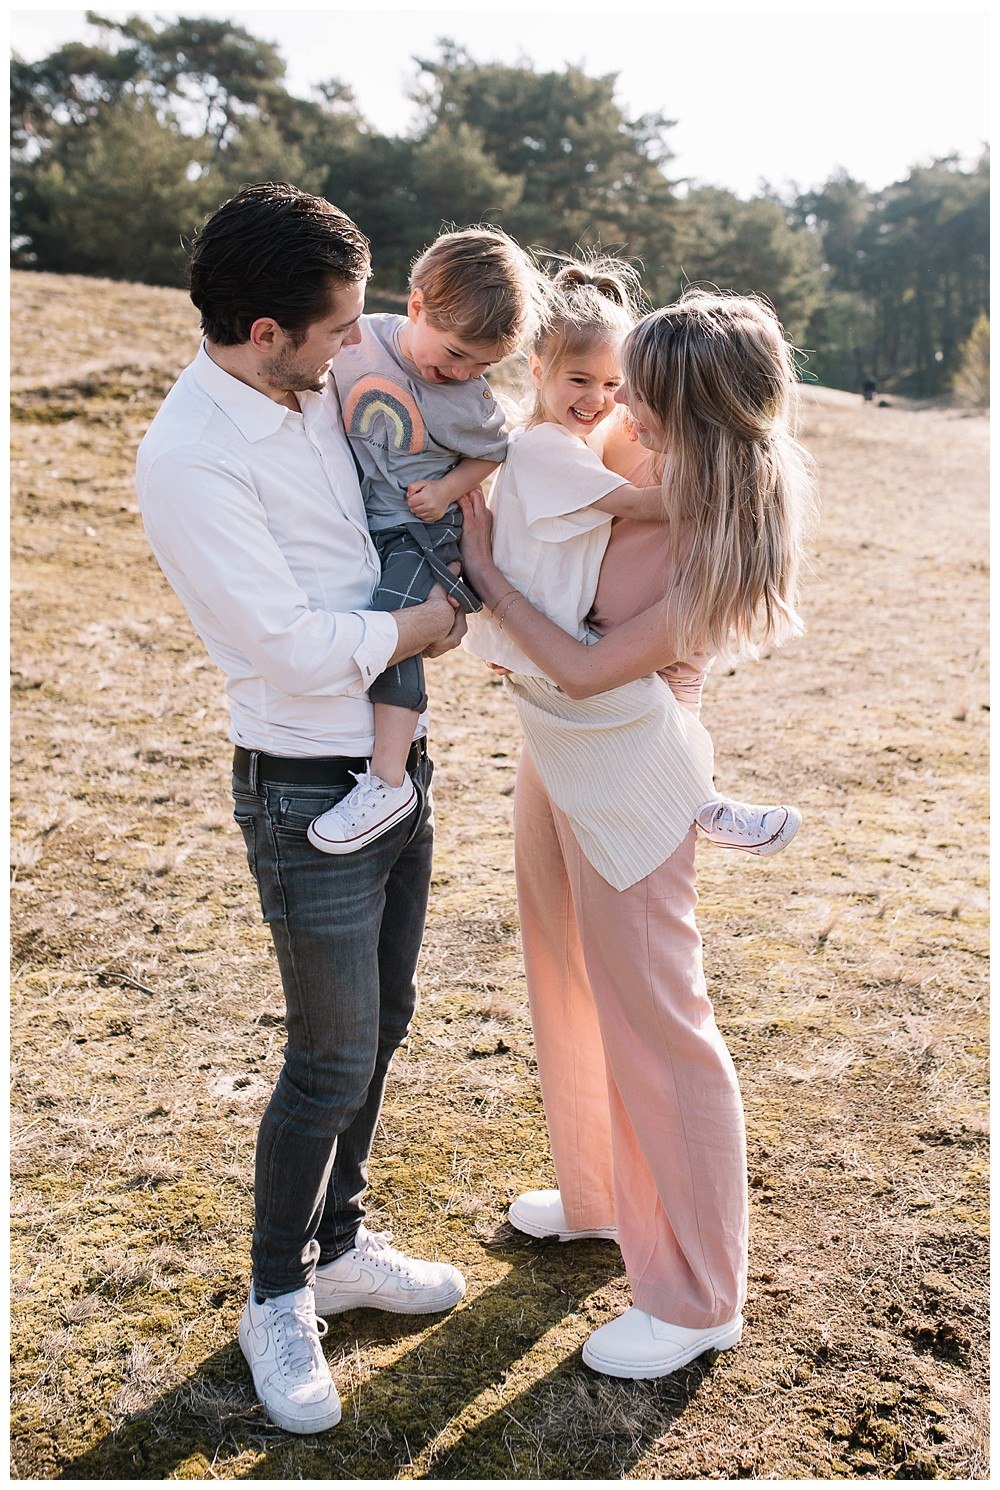 ohbelle_website_blog_gezinsshoot_Lifestyle_buiten_0253-kopie Lifestyle gezinsshoot Wekeromse Zand